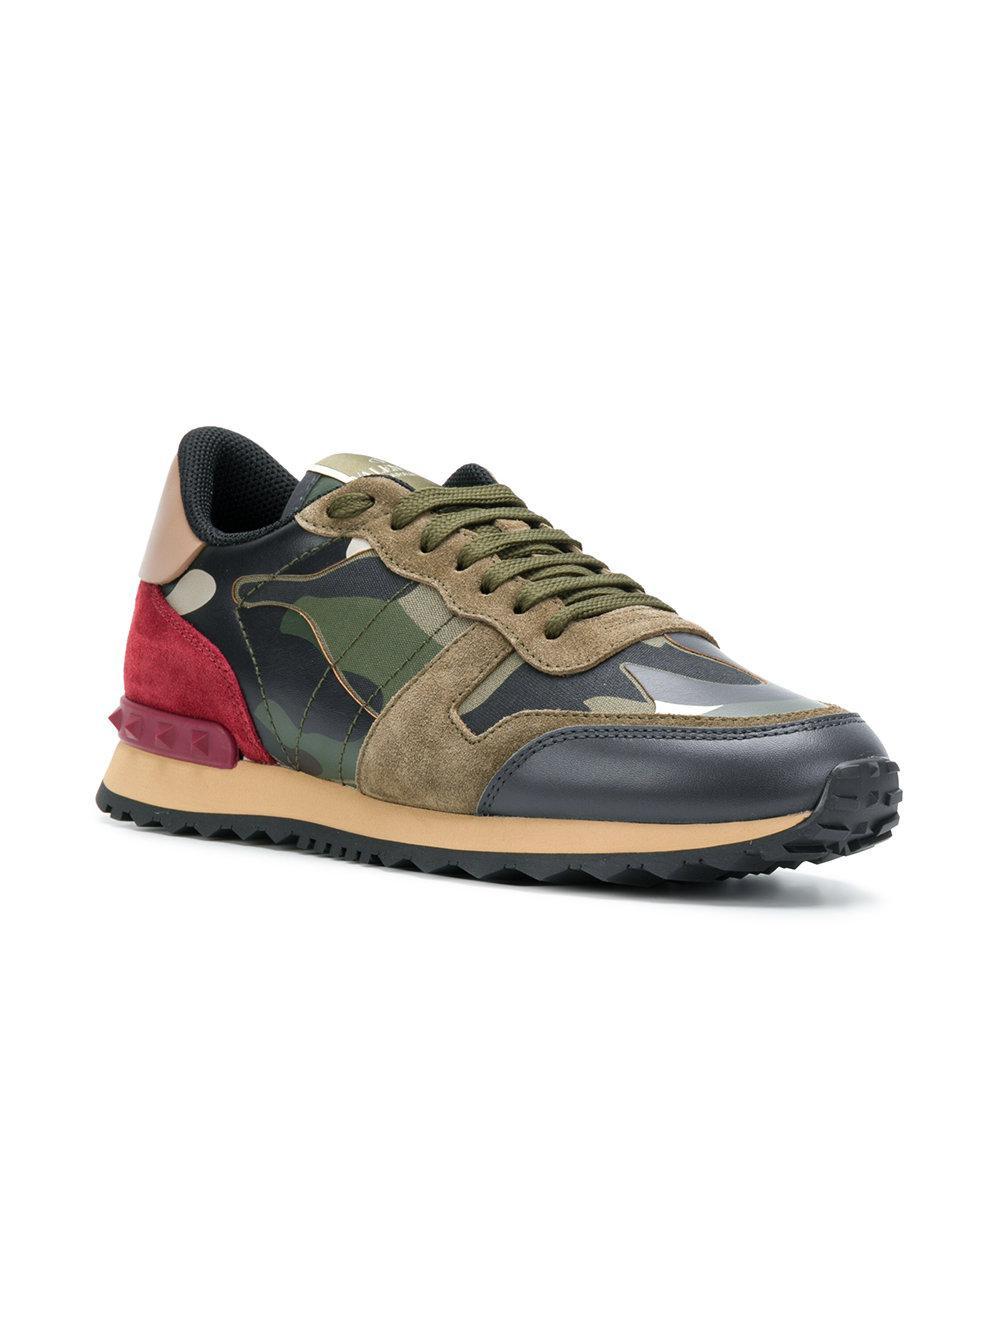 a85fca6aee96 Lyst - Valentino Garavani Rockrunner Sneakers in Green